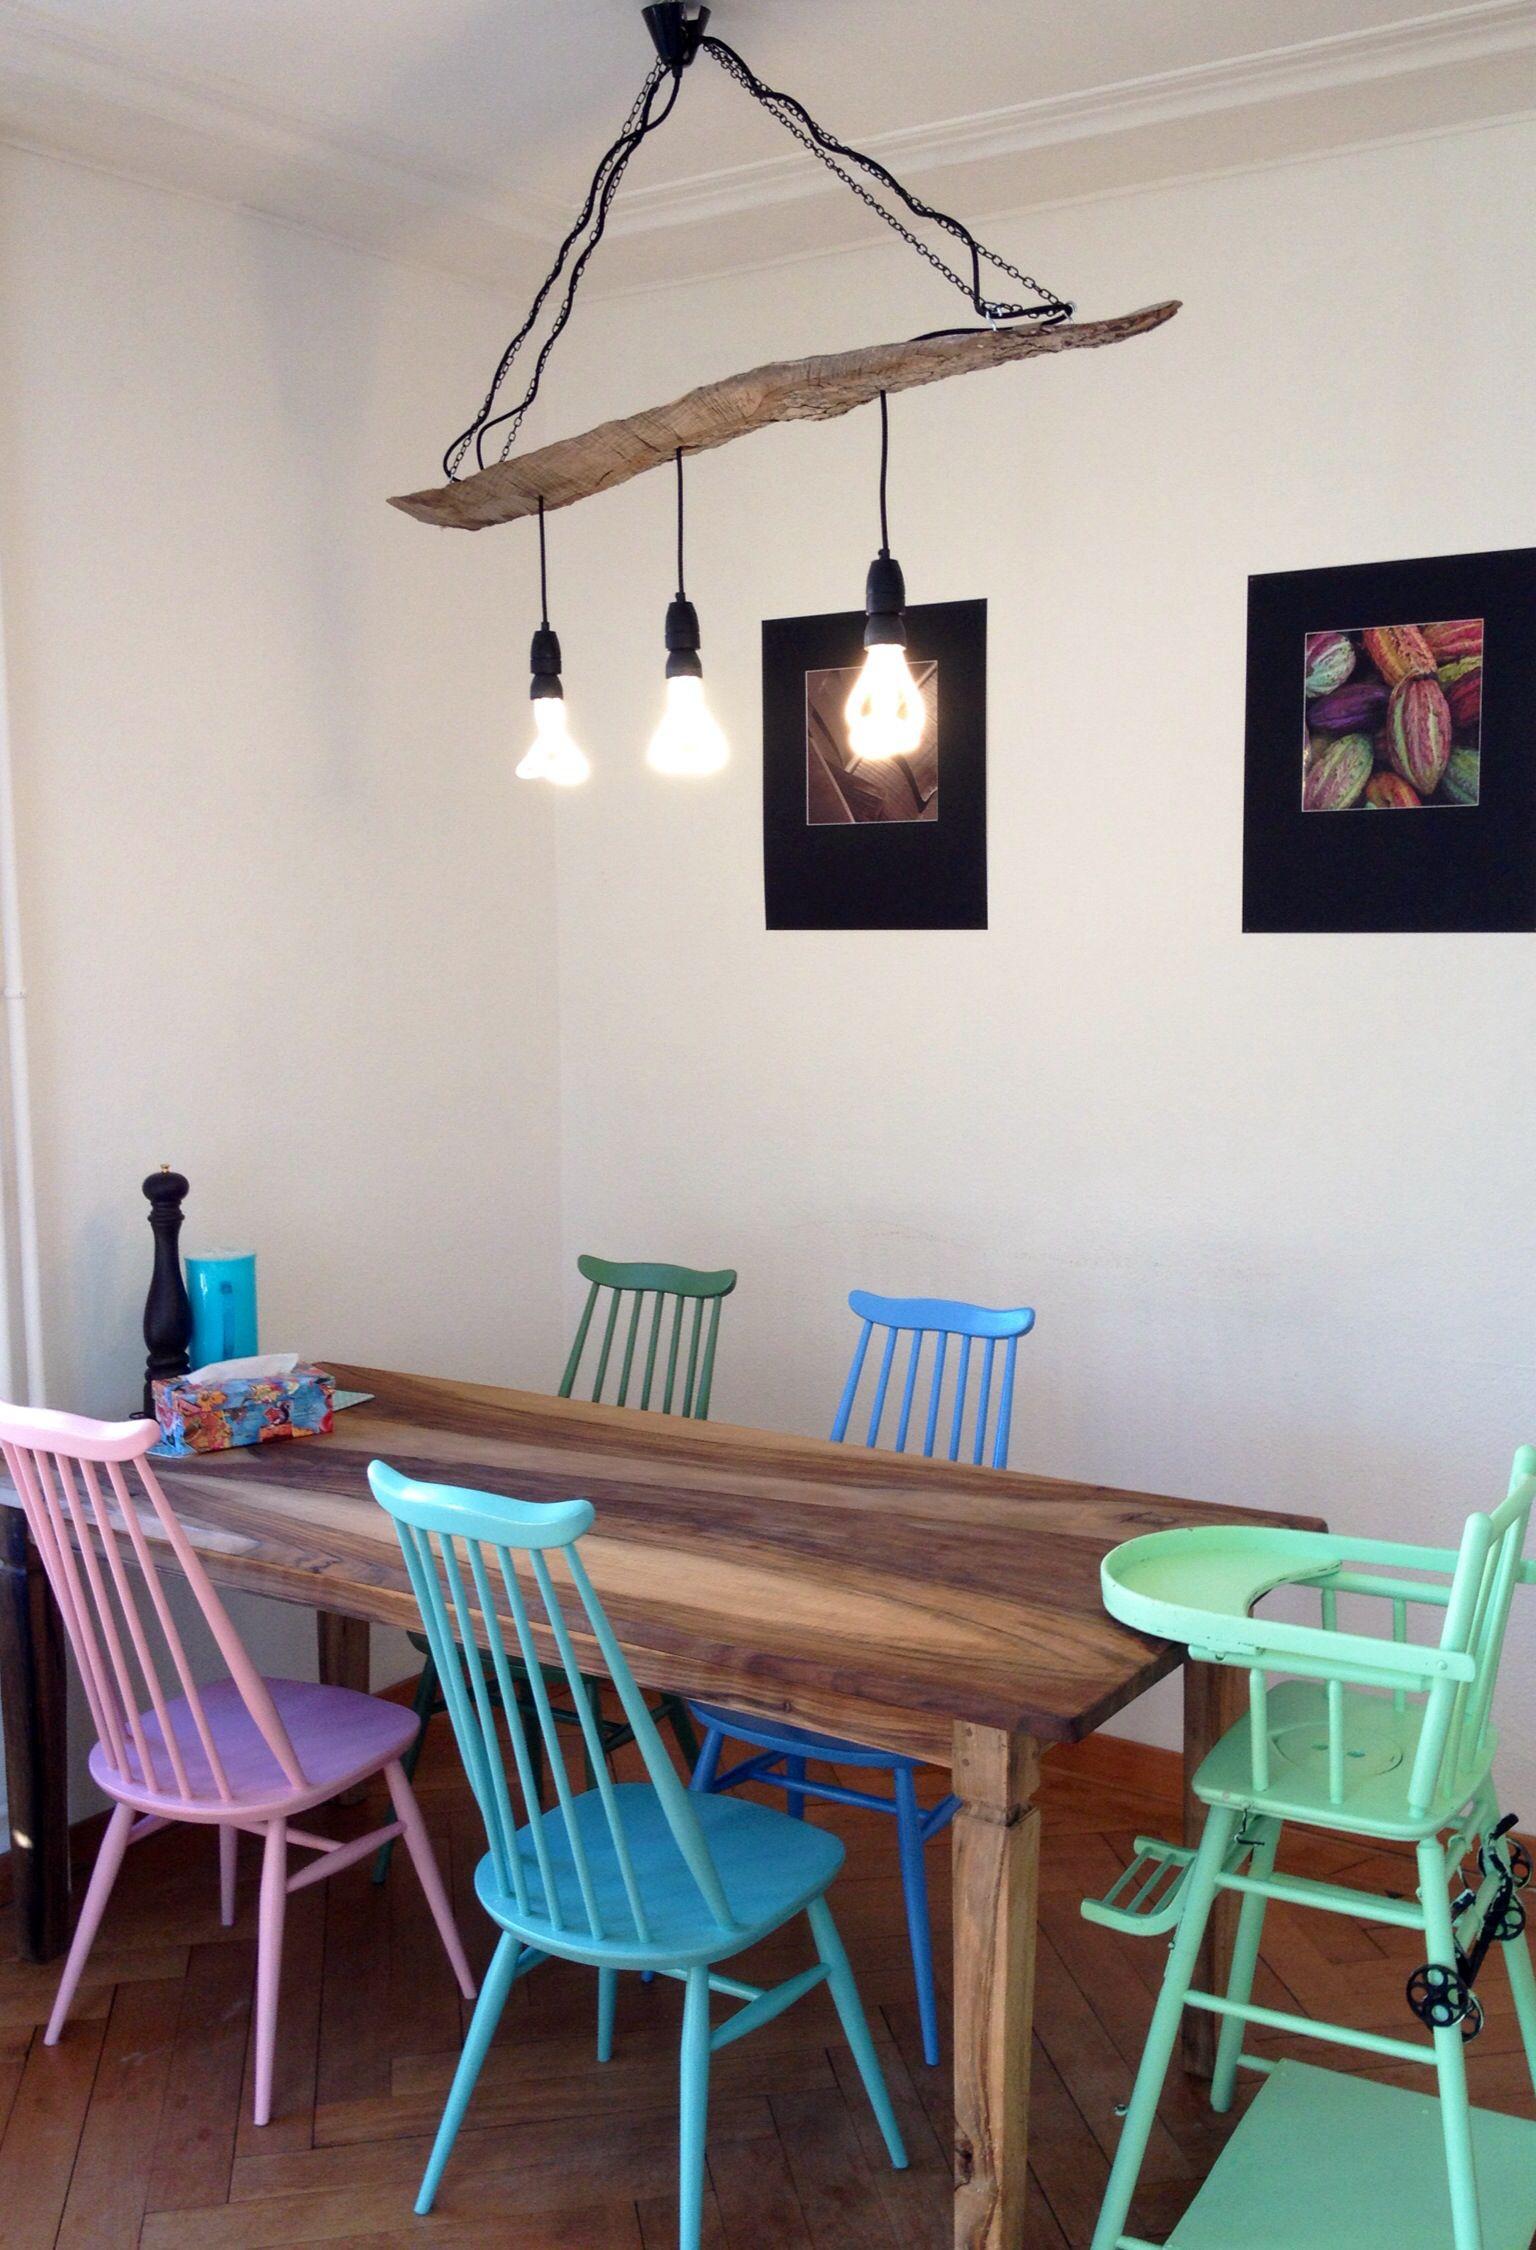 Home Made Lamps homemade lamp | homemade deco & furniture | pinterest | homemade